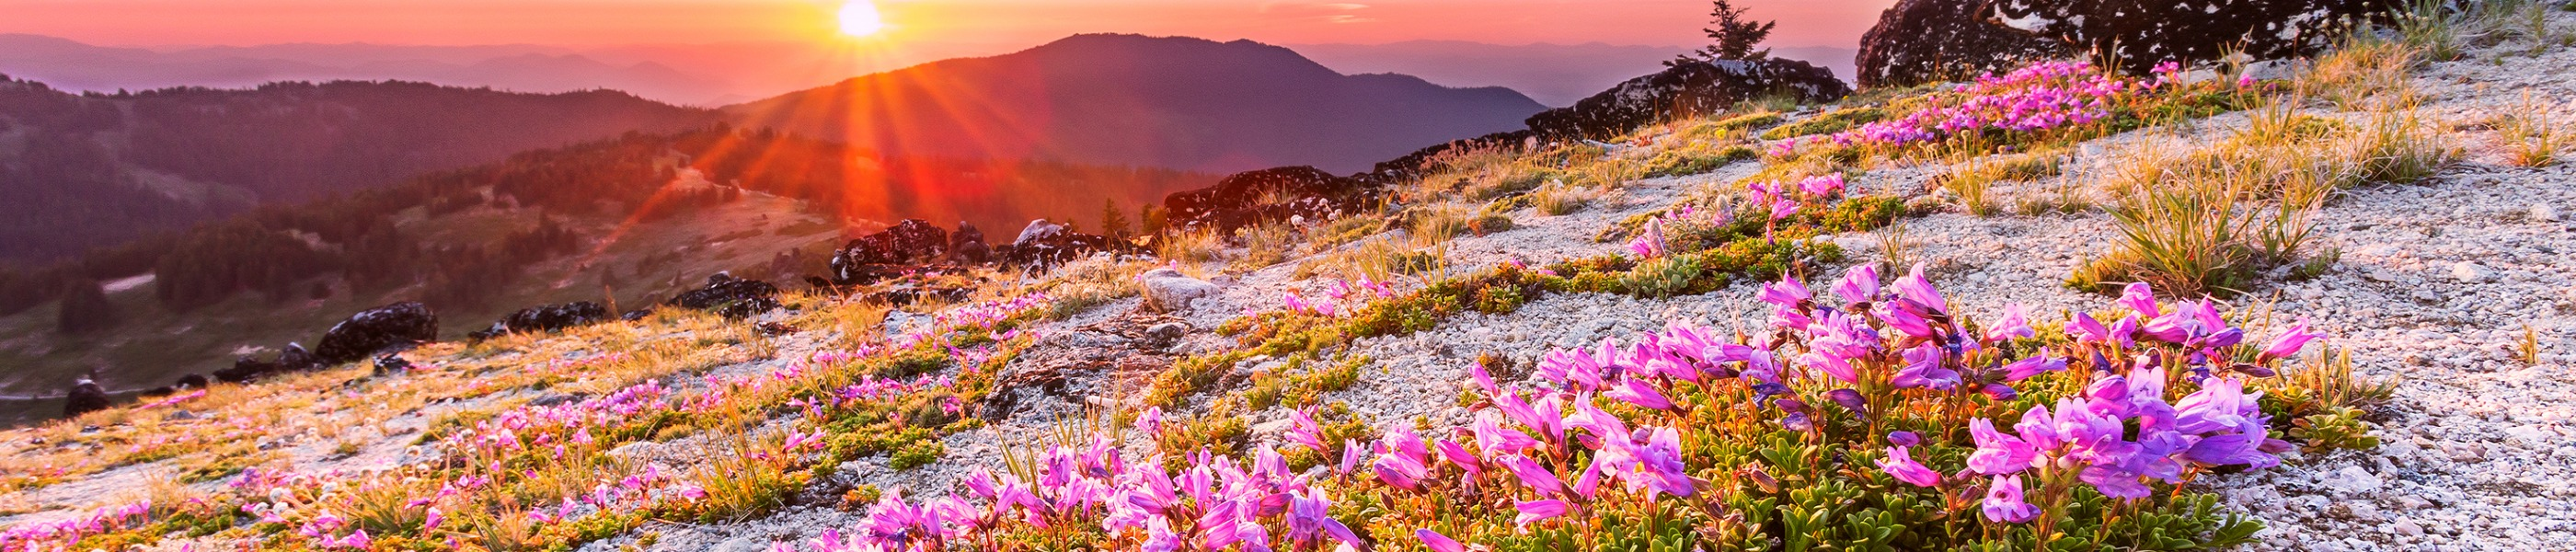 A magnificent sunrise over Mt. Ashland